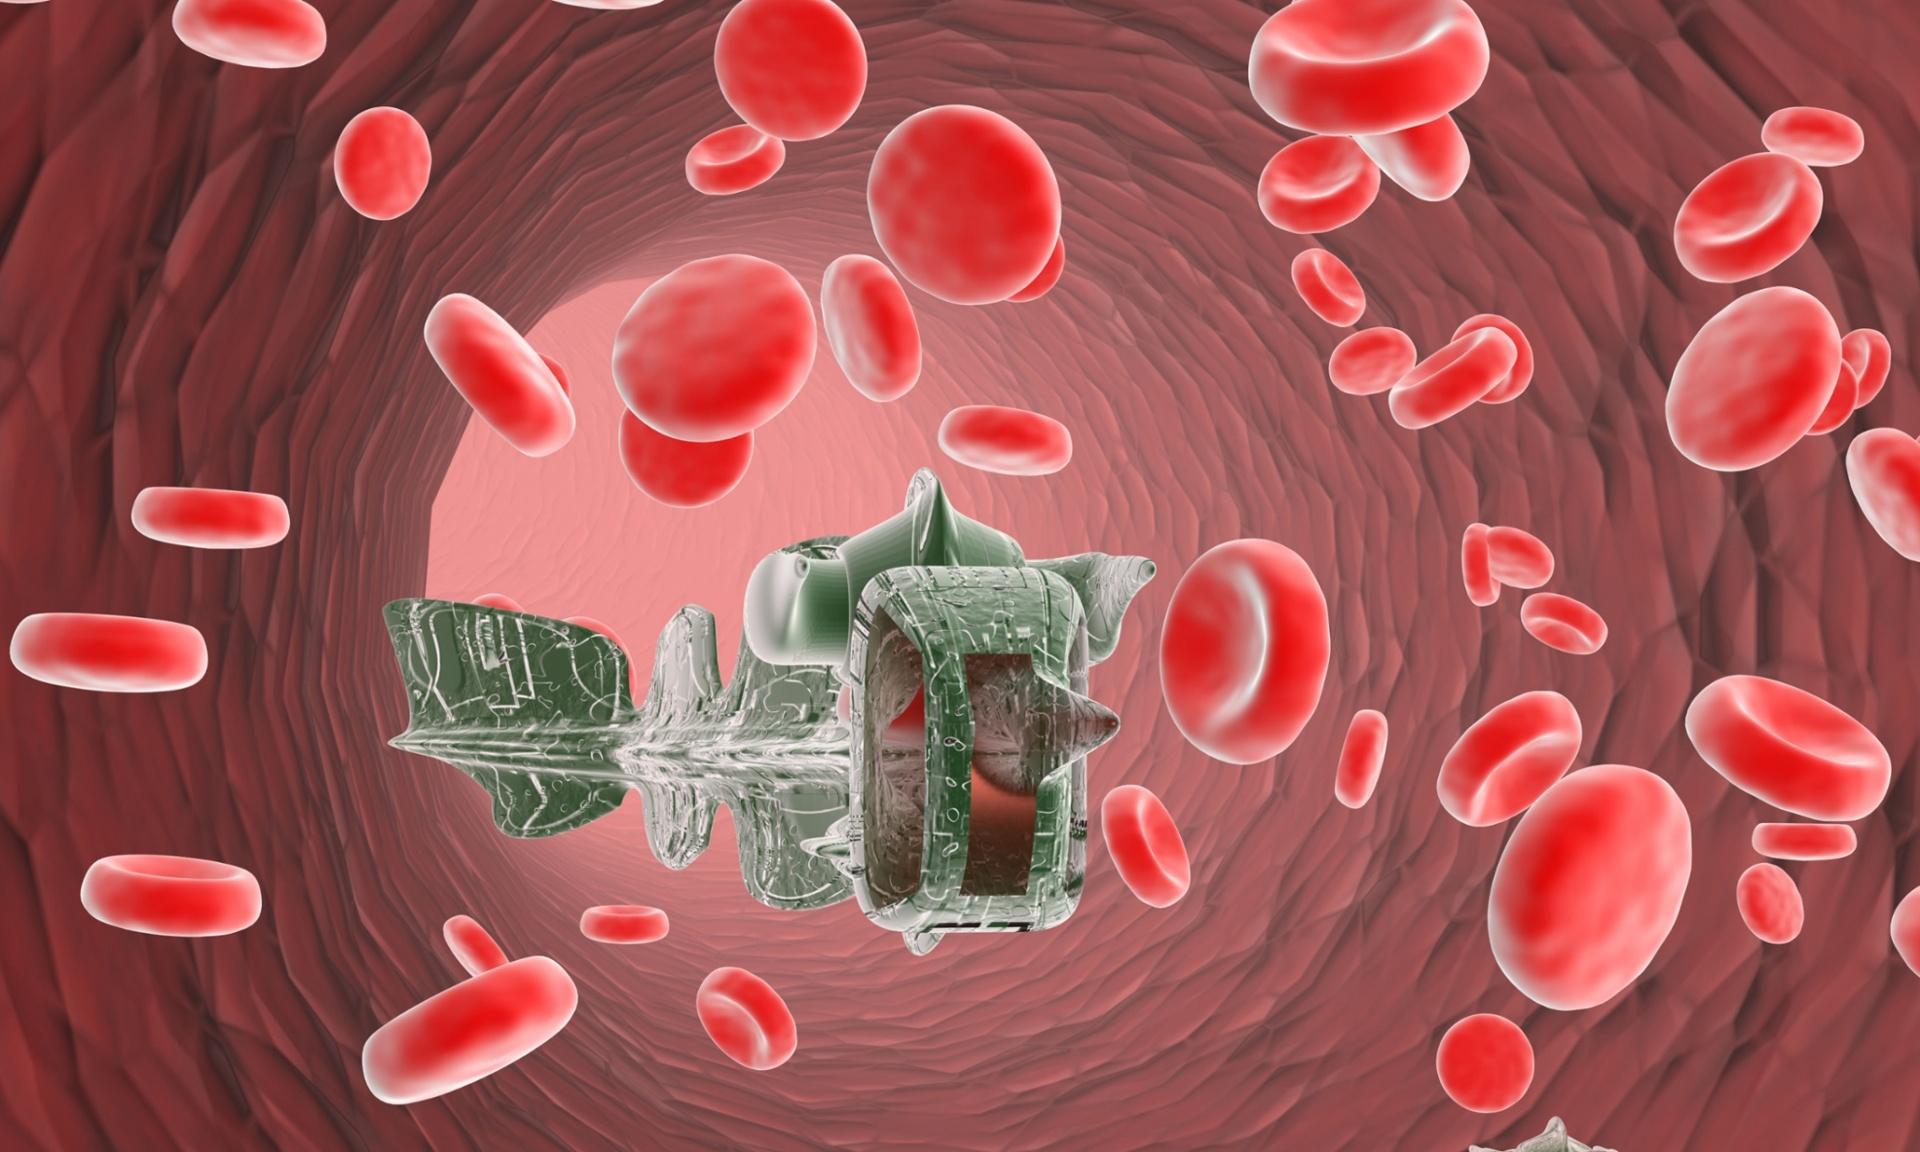 artist_s_impression_of_a_medical_nanorobot_in_the_blood_stream_illustration_christian_darkin_alamy.jpeg